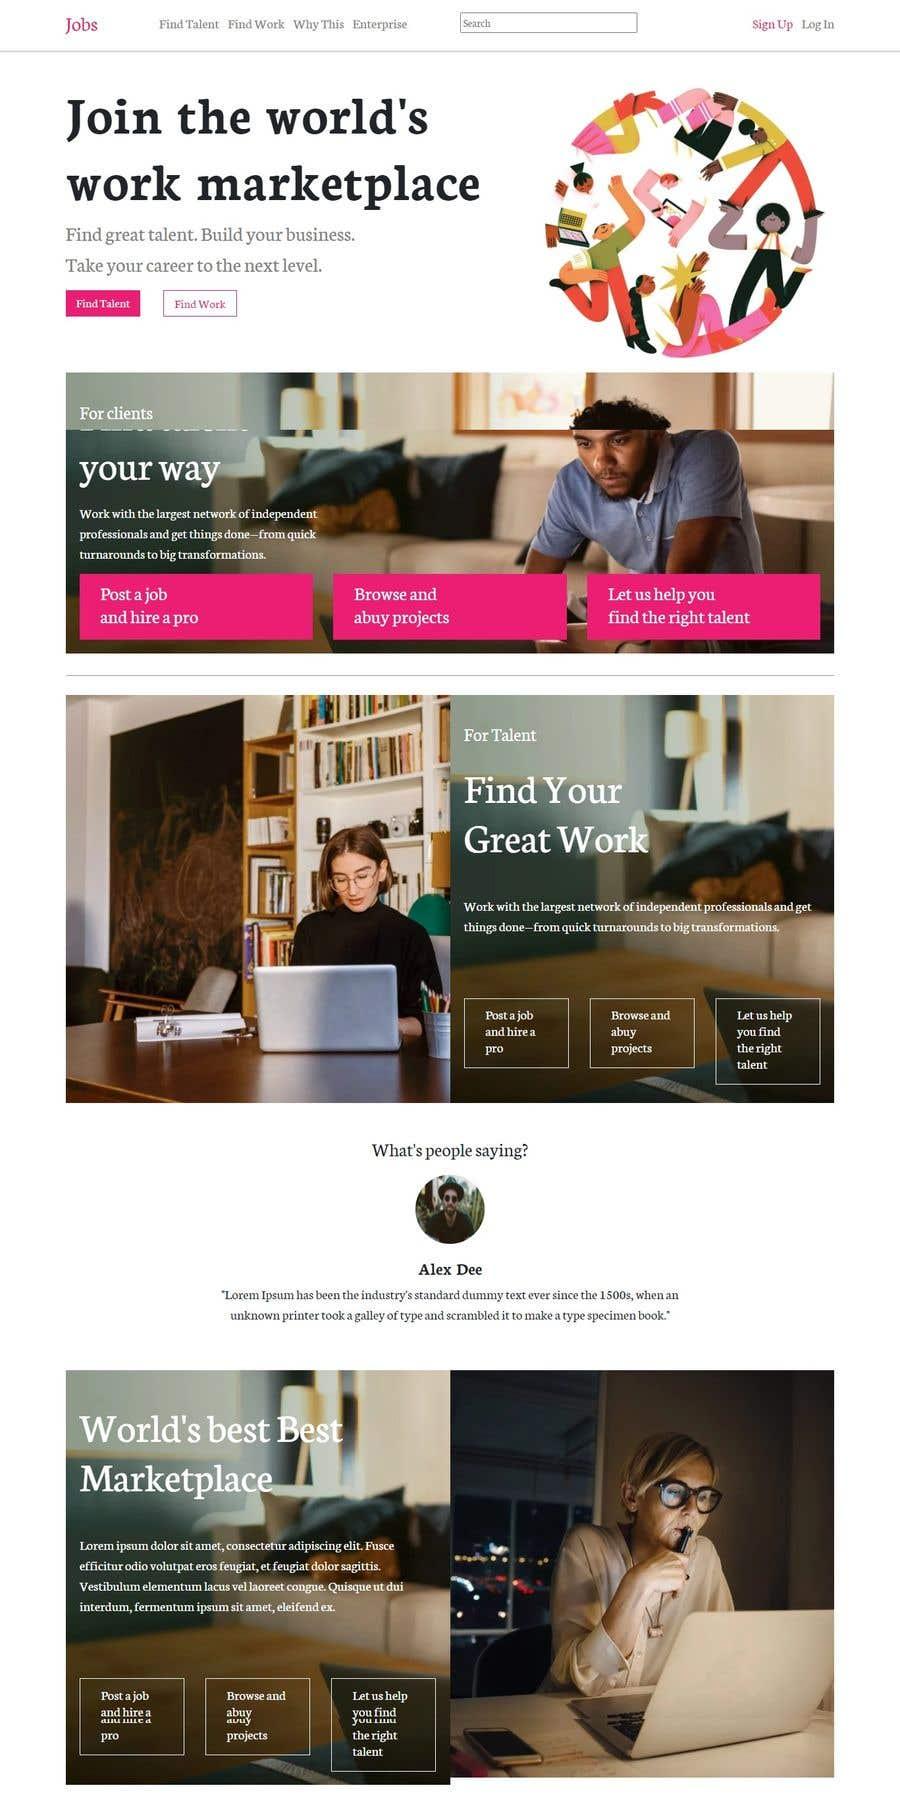 Konkurrenceindlæg #                                        1                                      for                                         Build me a stunning Website/Portal (Looking for UI experts)